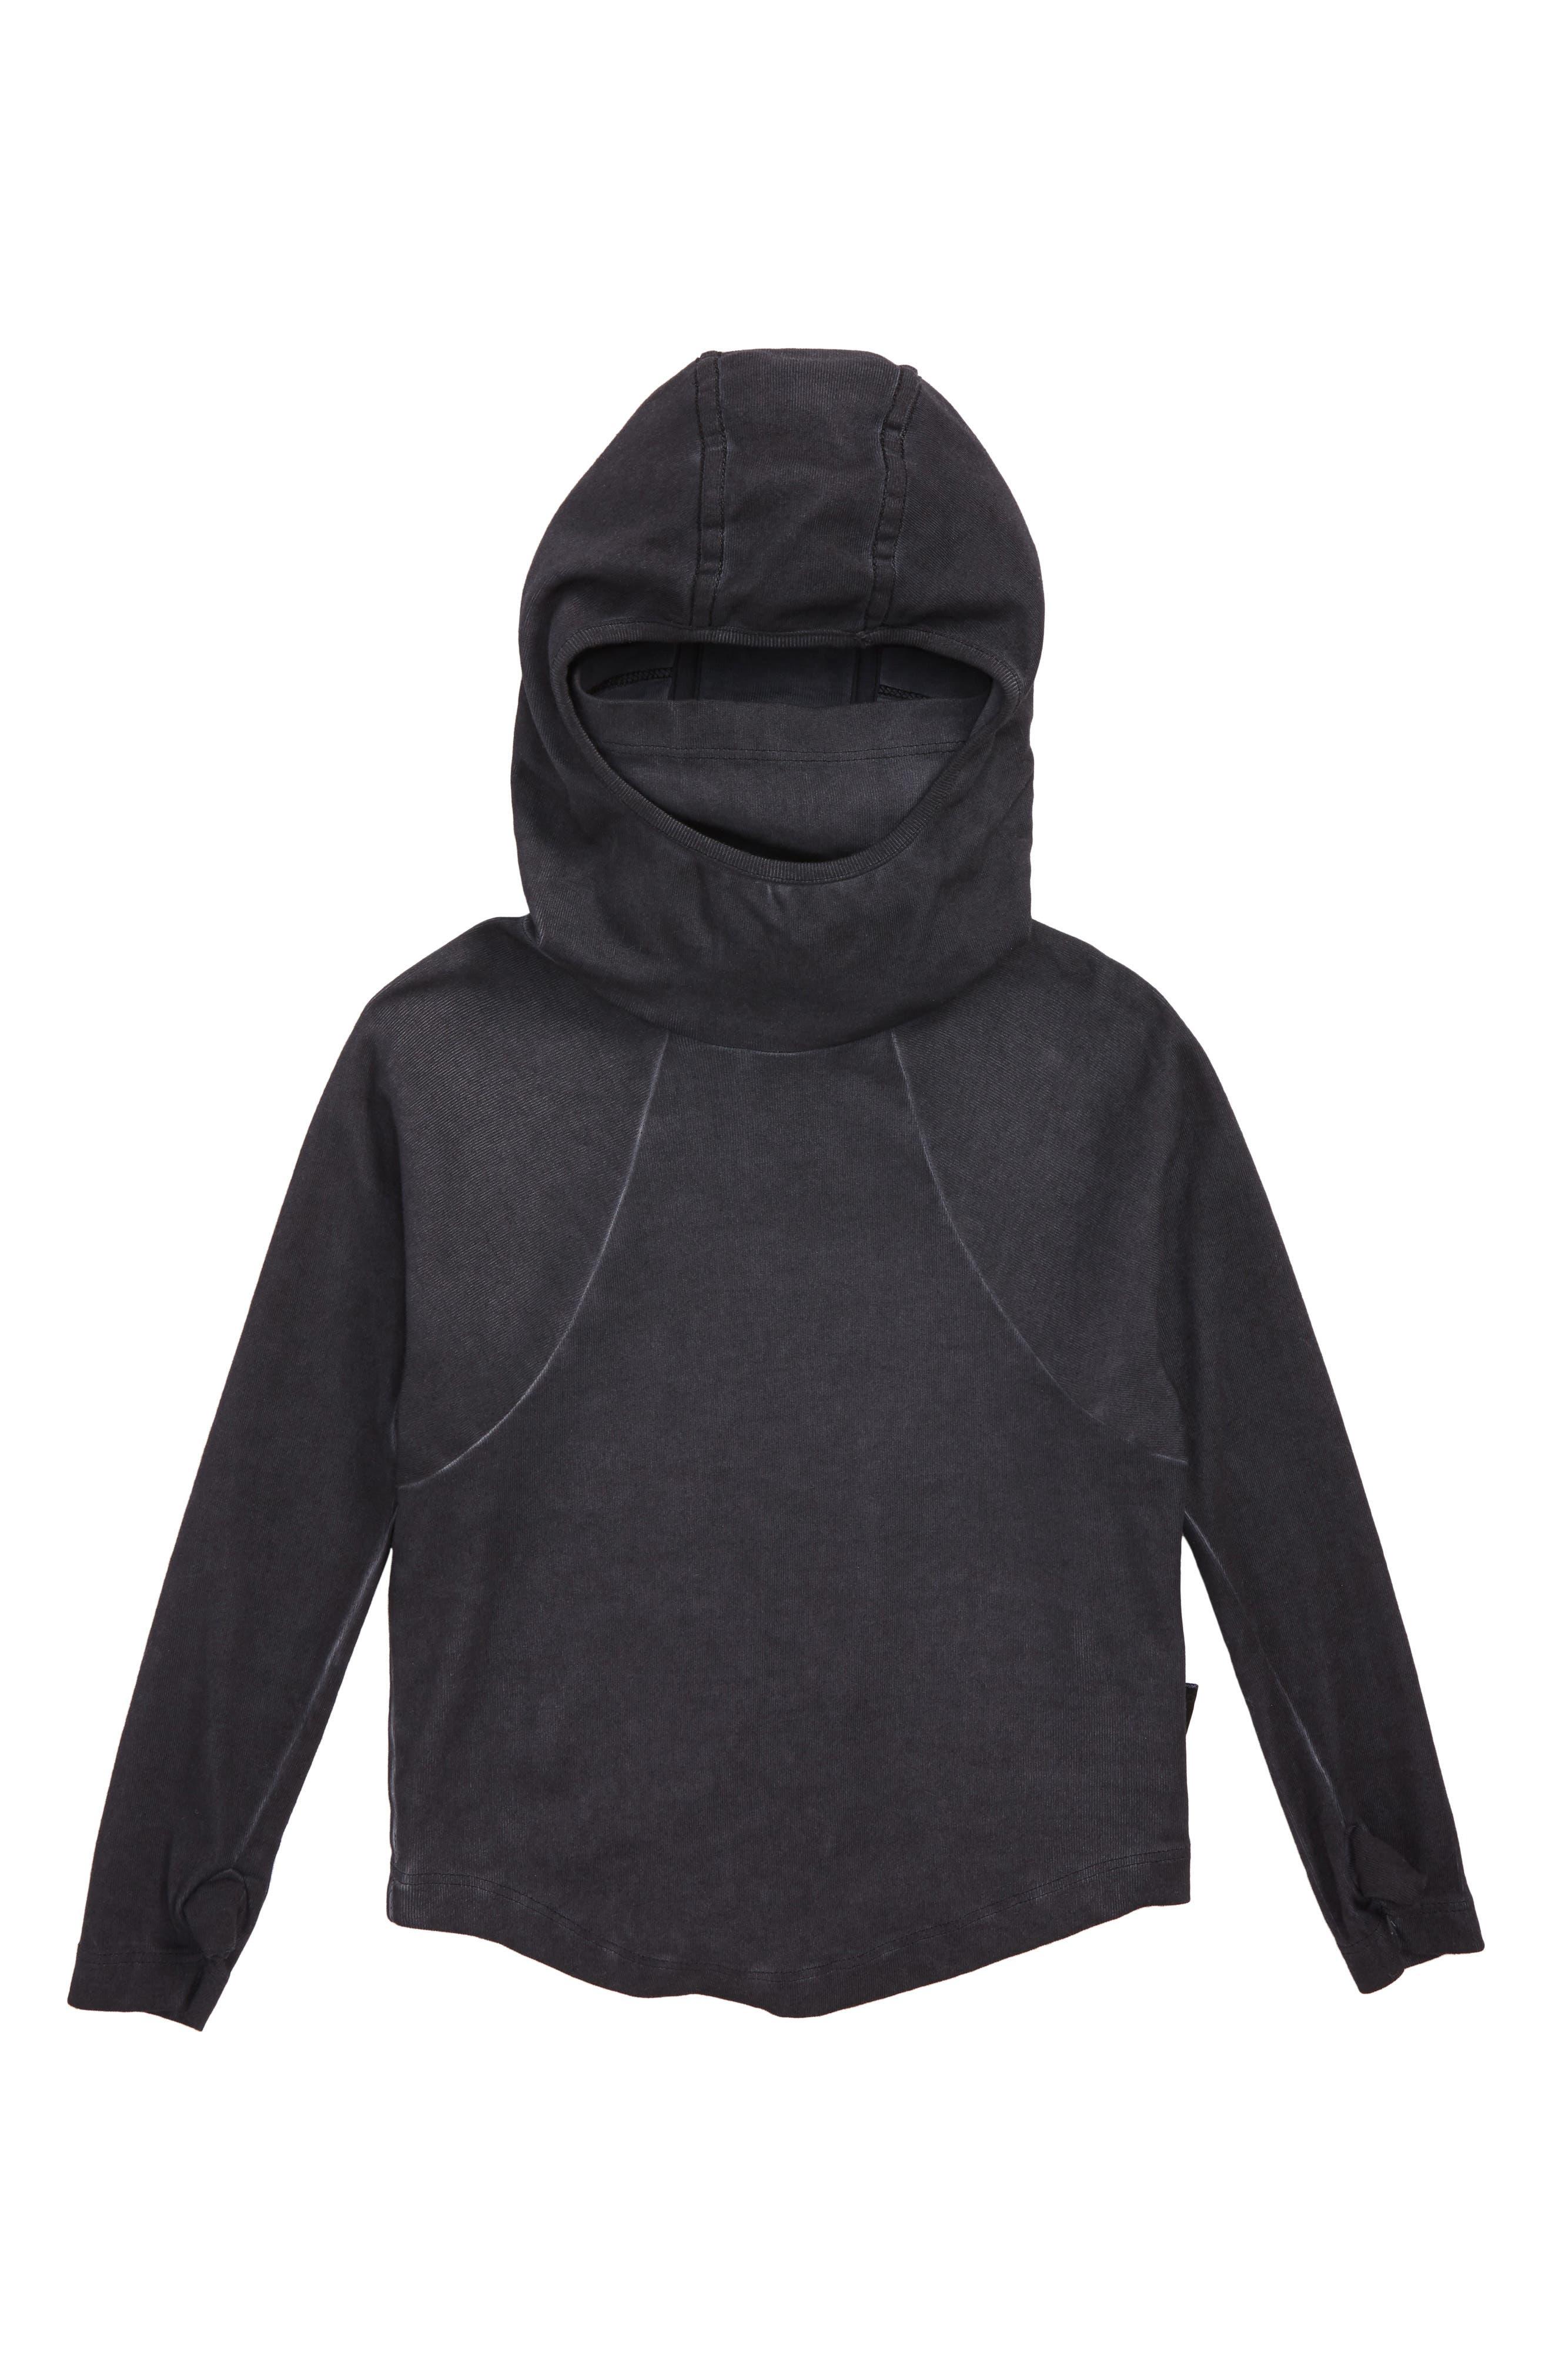 Ninja Hooded Shirt,                         Main,                         color, DYED BLACK